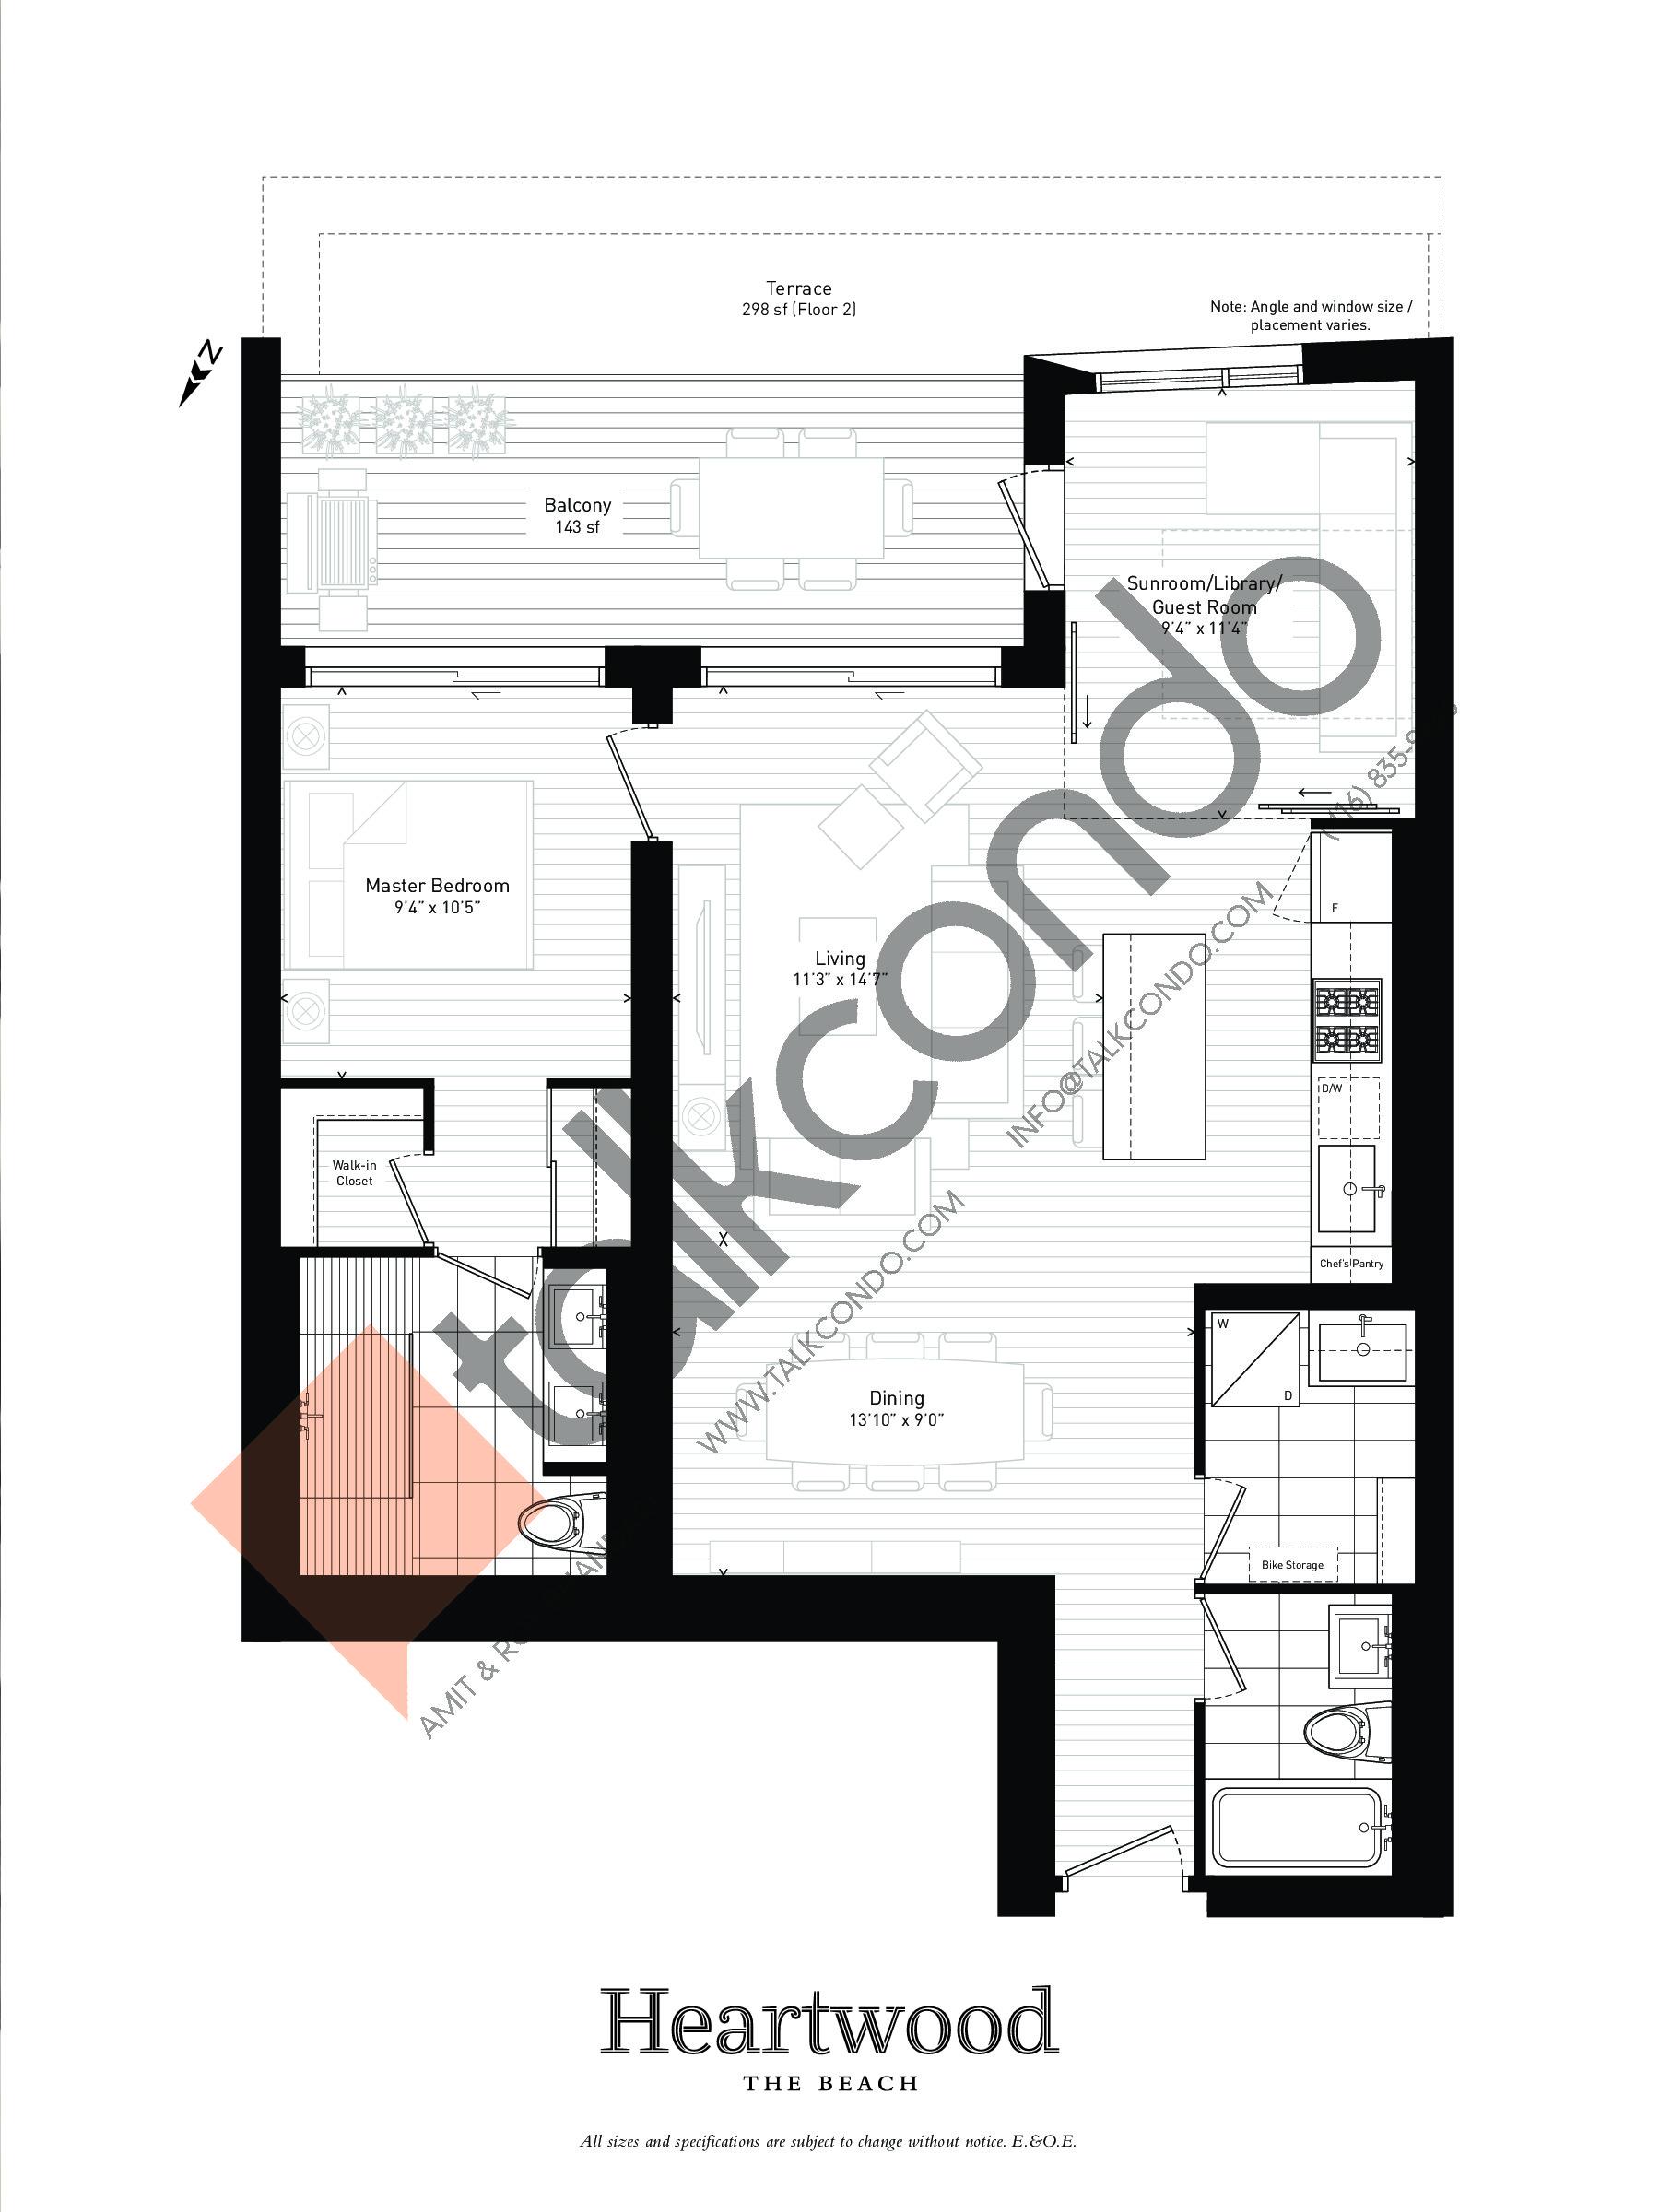 01 Floor Plan at Heartwood the Beach Condos - 1002 sq.ft